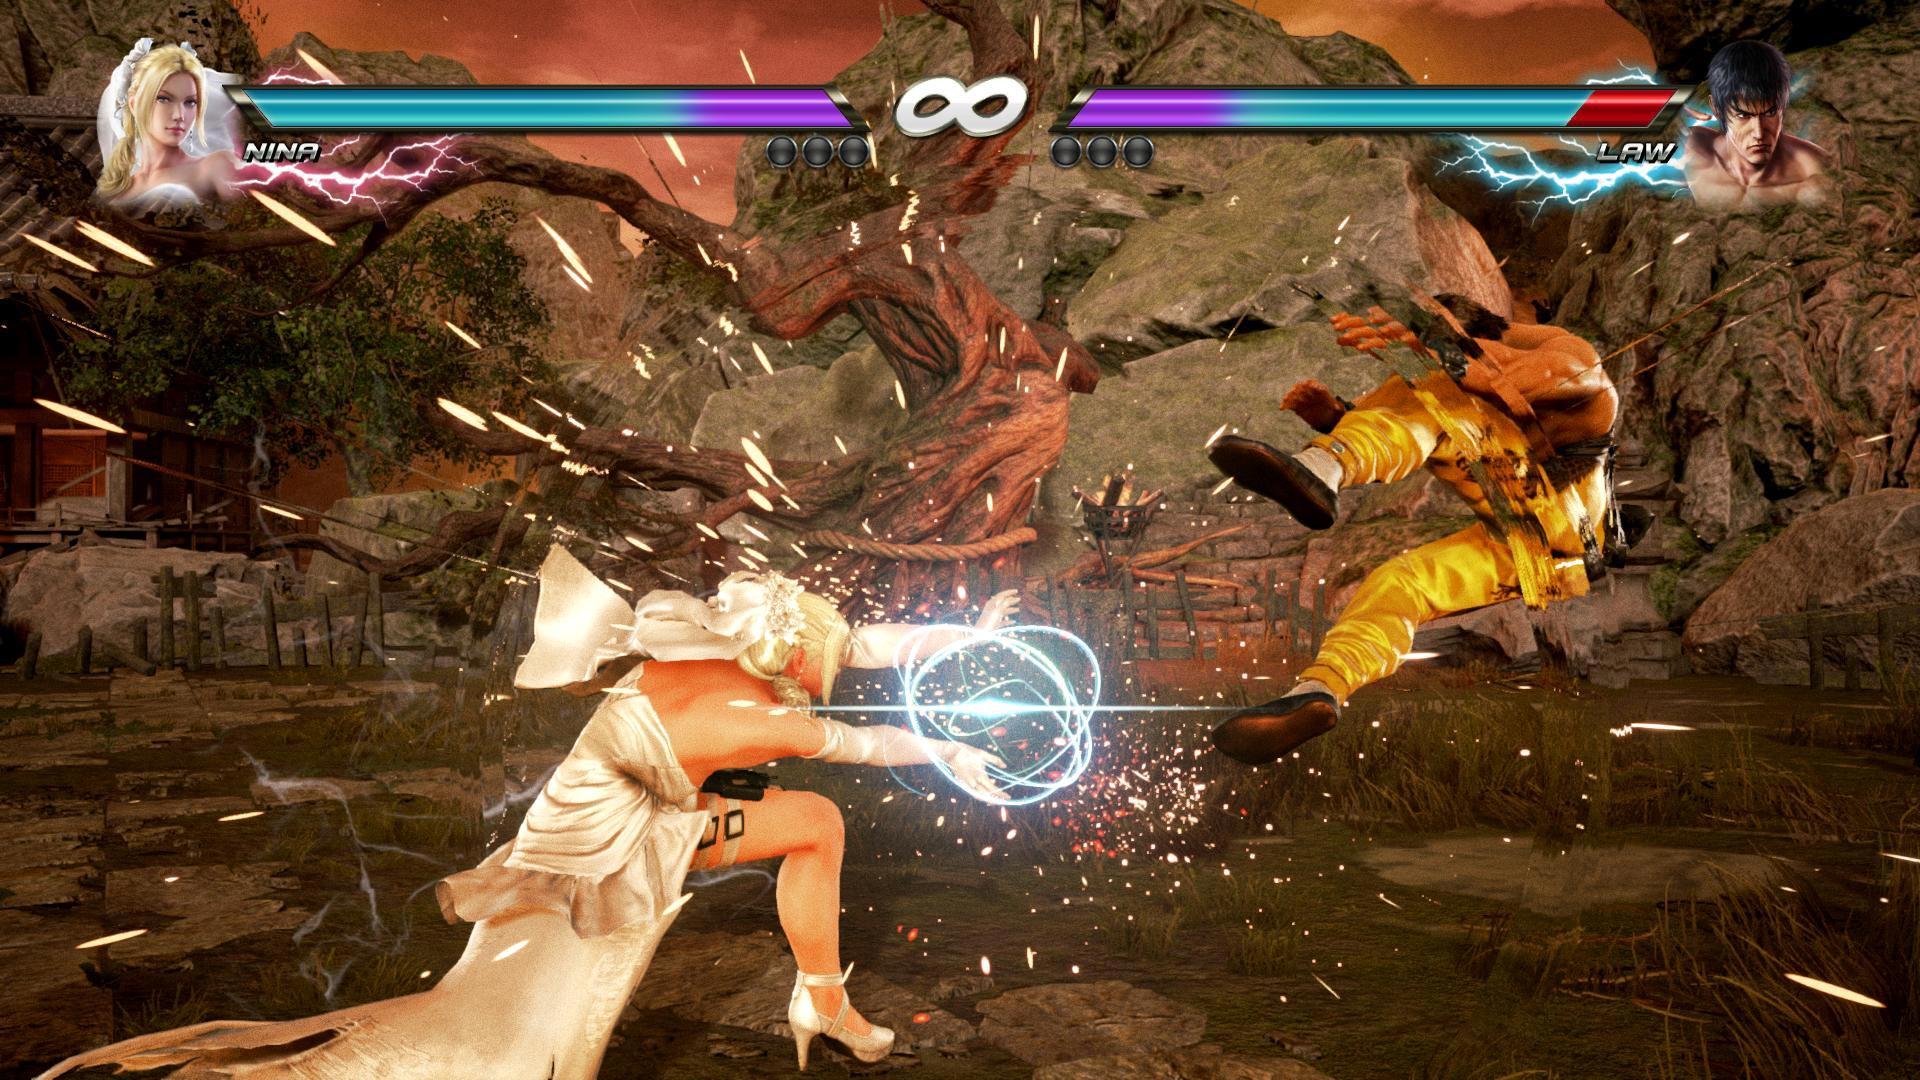 Tekken 7 Anniversary Update 4 out of 8 image gallery